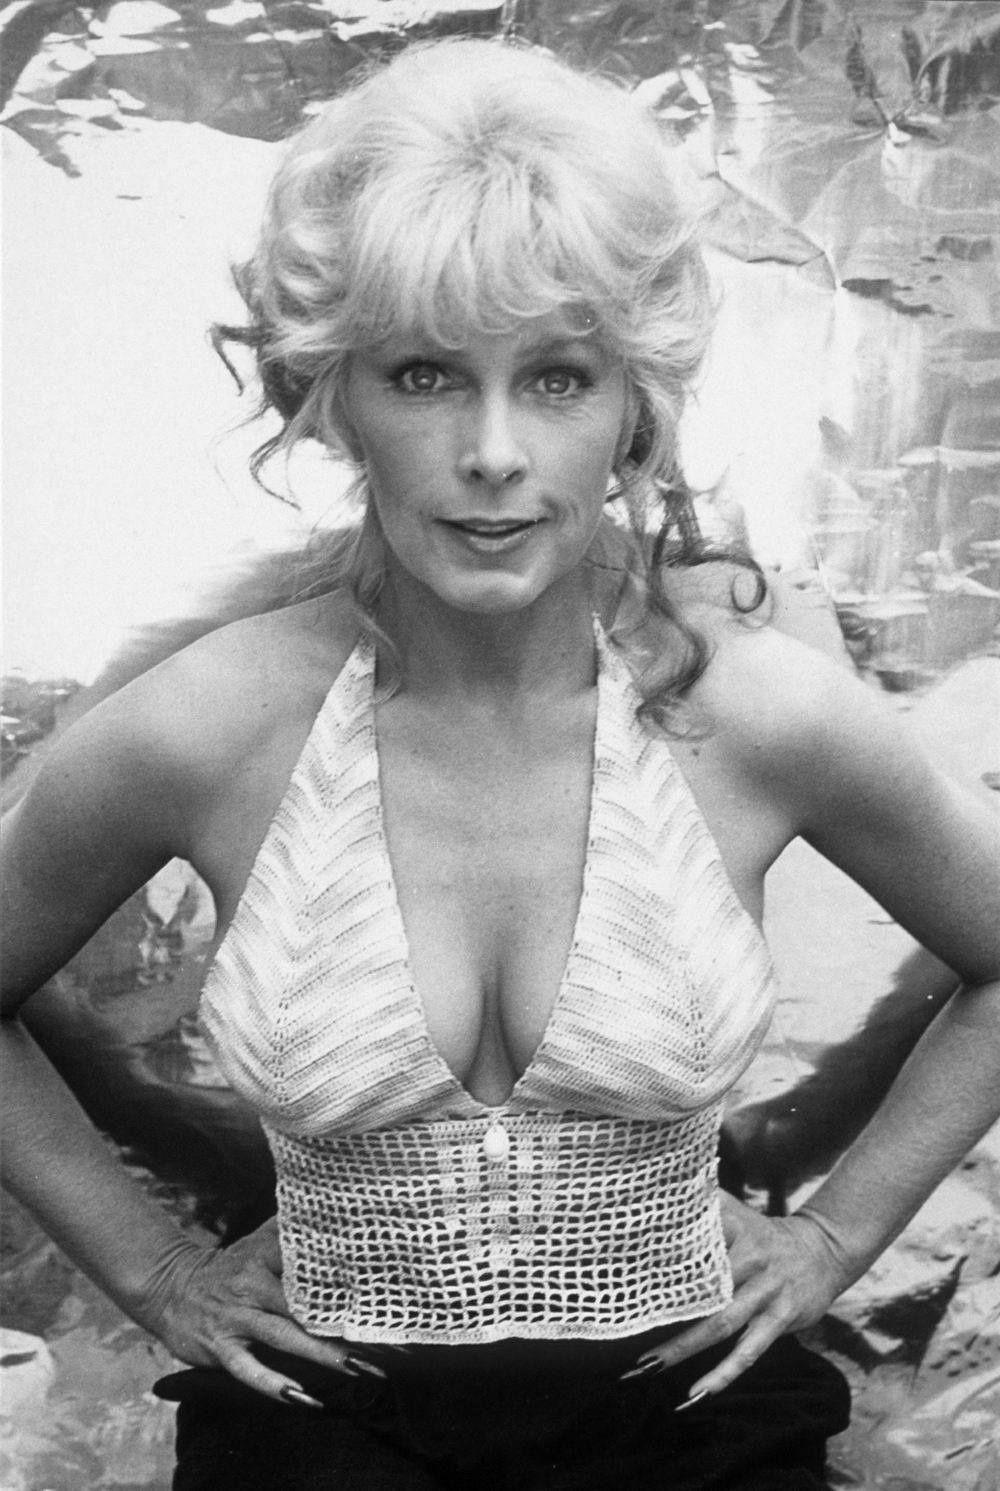 Thomas Sangster (born 1990),Georgia Engel born July 28, 1948 (age 70) Erotic videos Elyse Sewell,Michelle Ryan (born 1984)